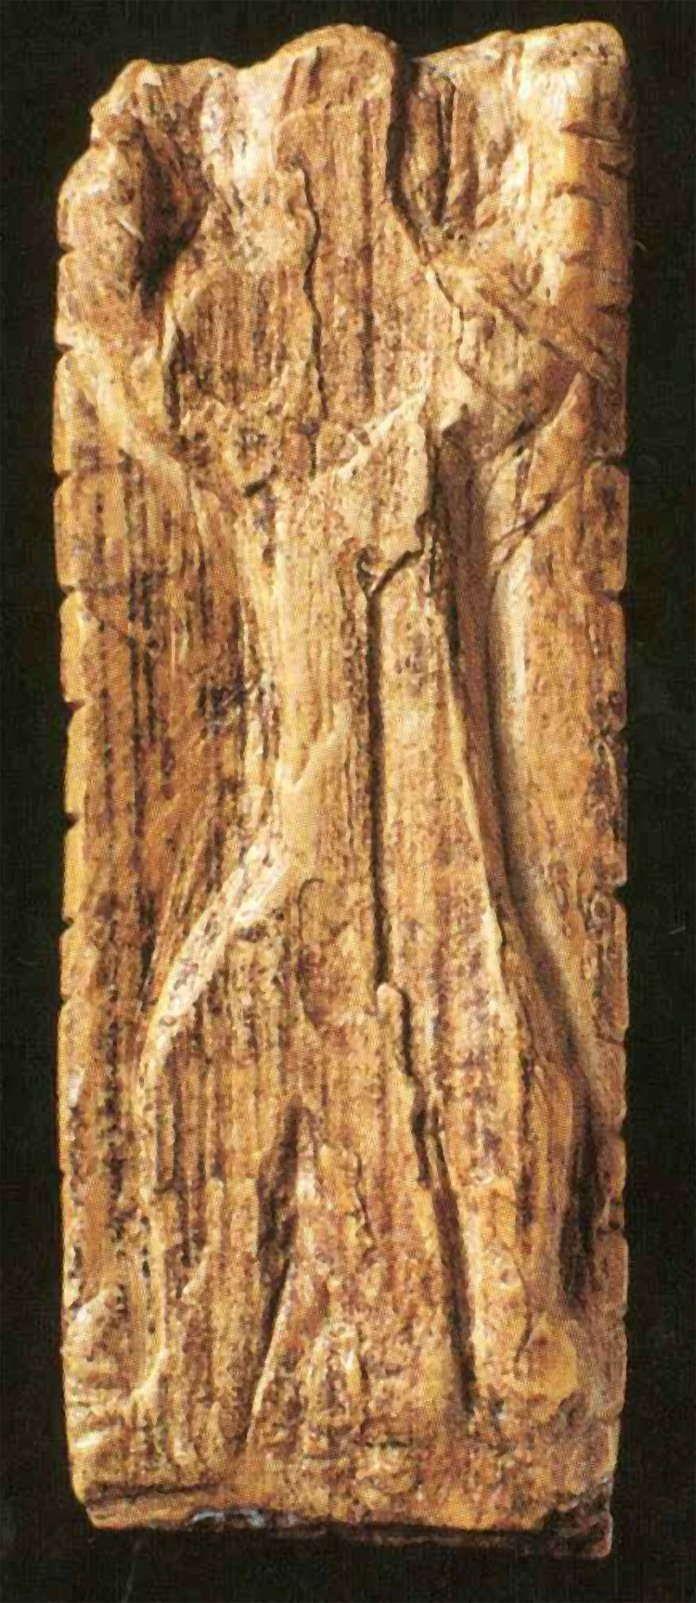 The Adorant / The Worshipper -  Aurignacian, probably 35,000–32,000 BP